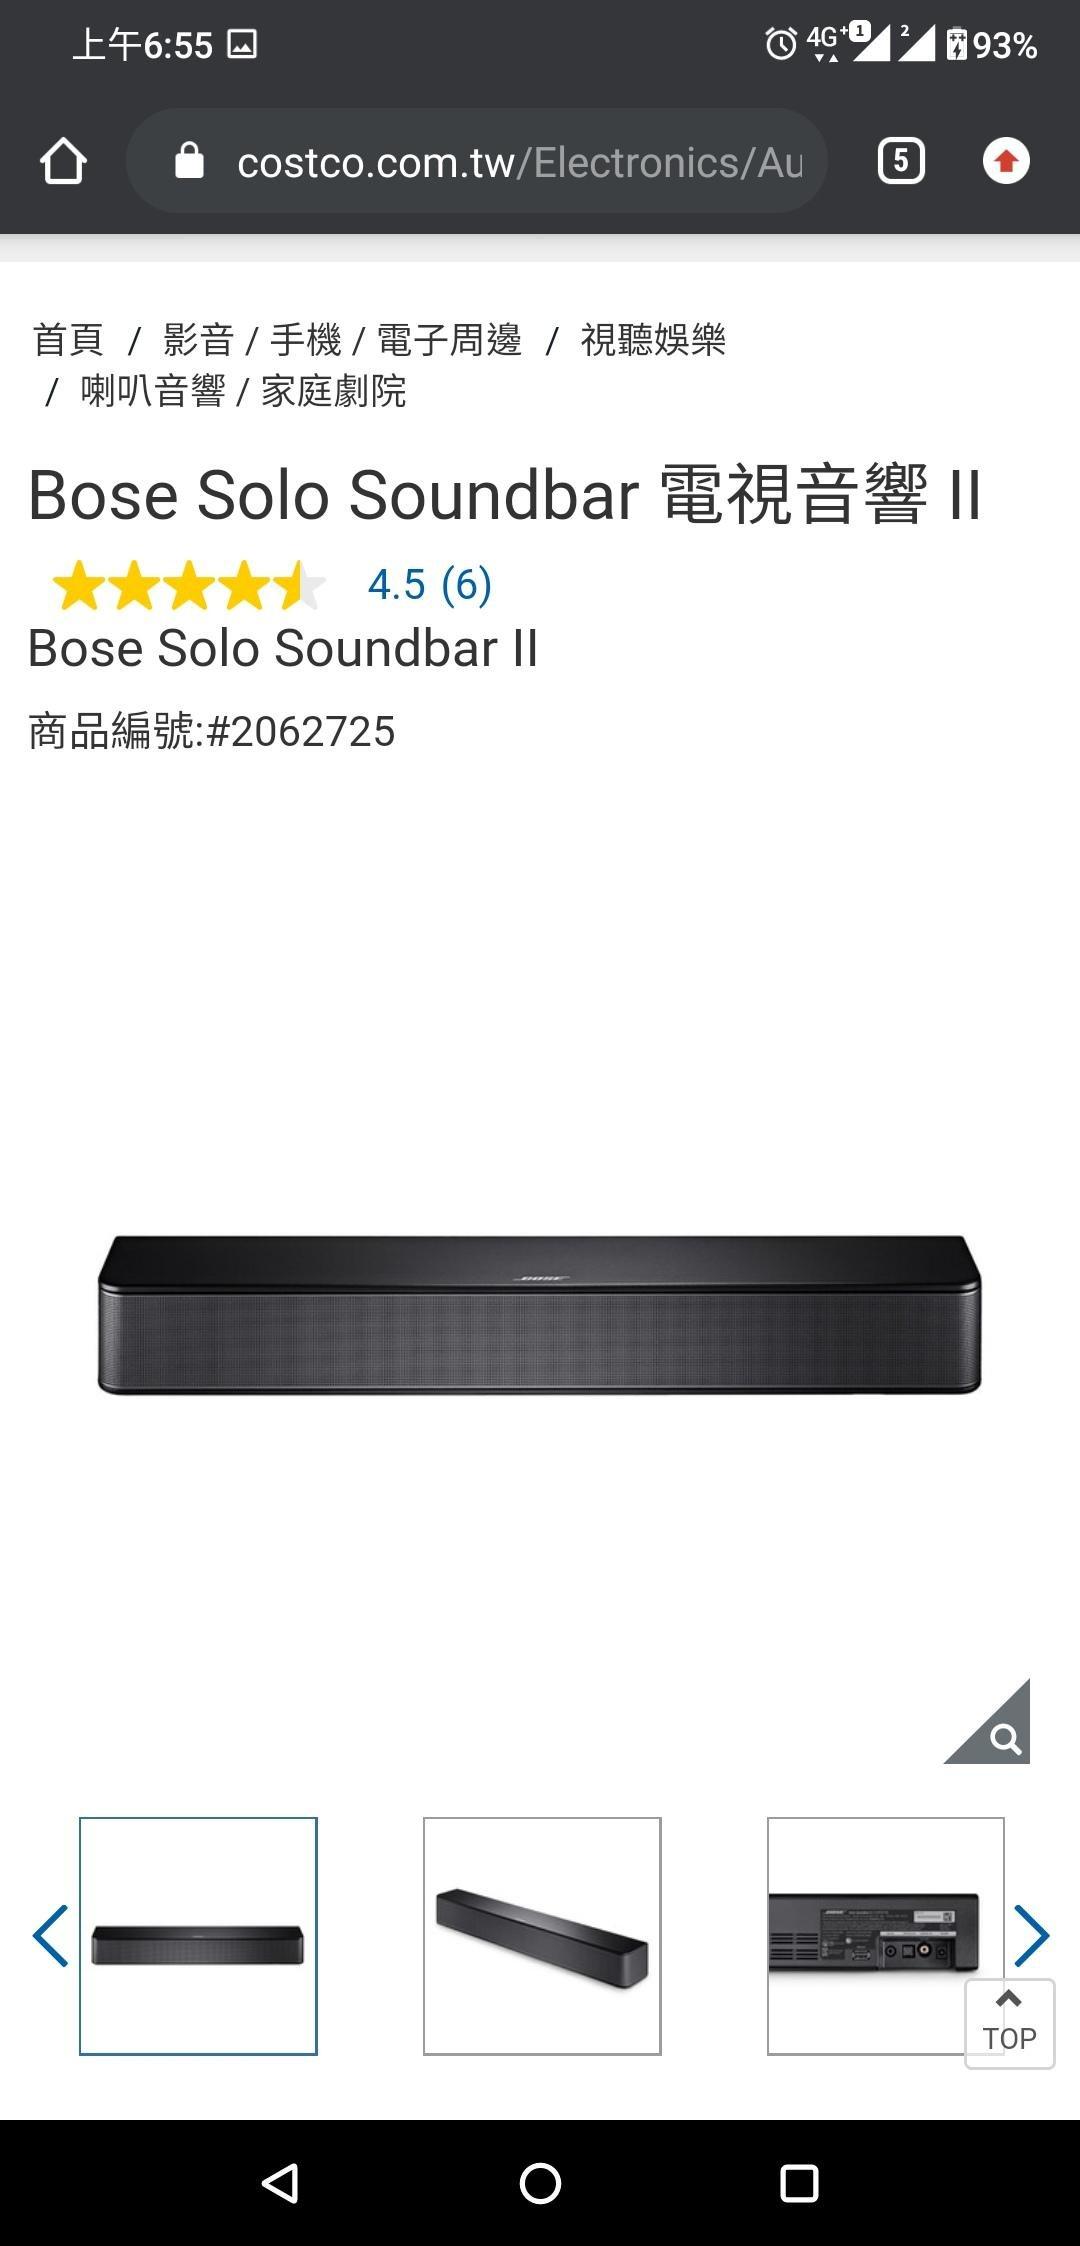 COSTCO官網線上代購宅配免運~Bose Solo Soundbar 電視音響 II